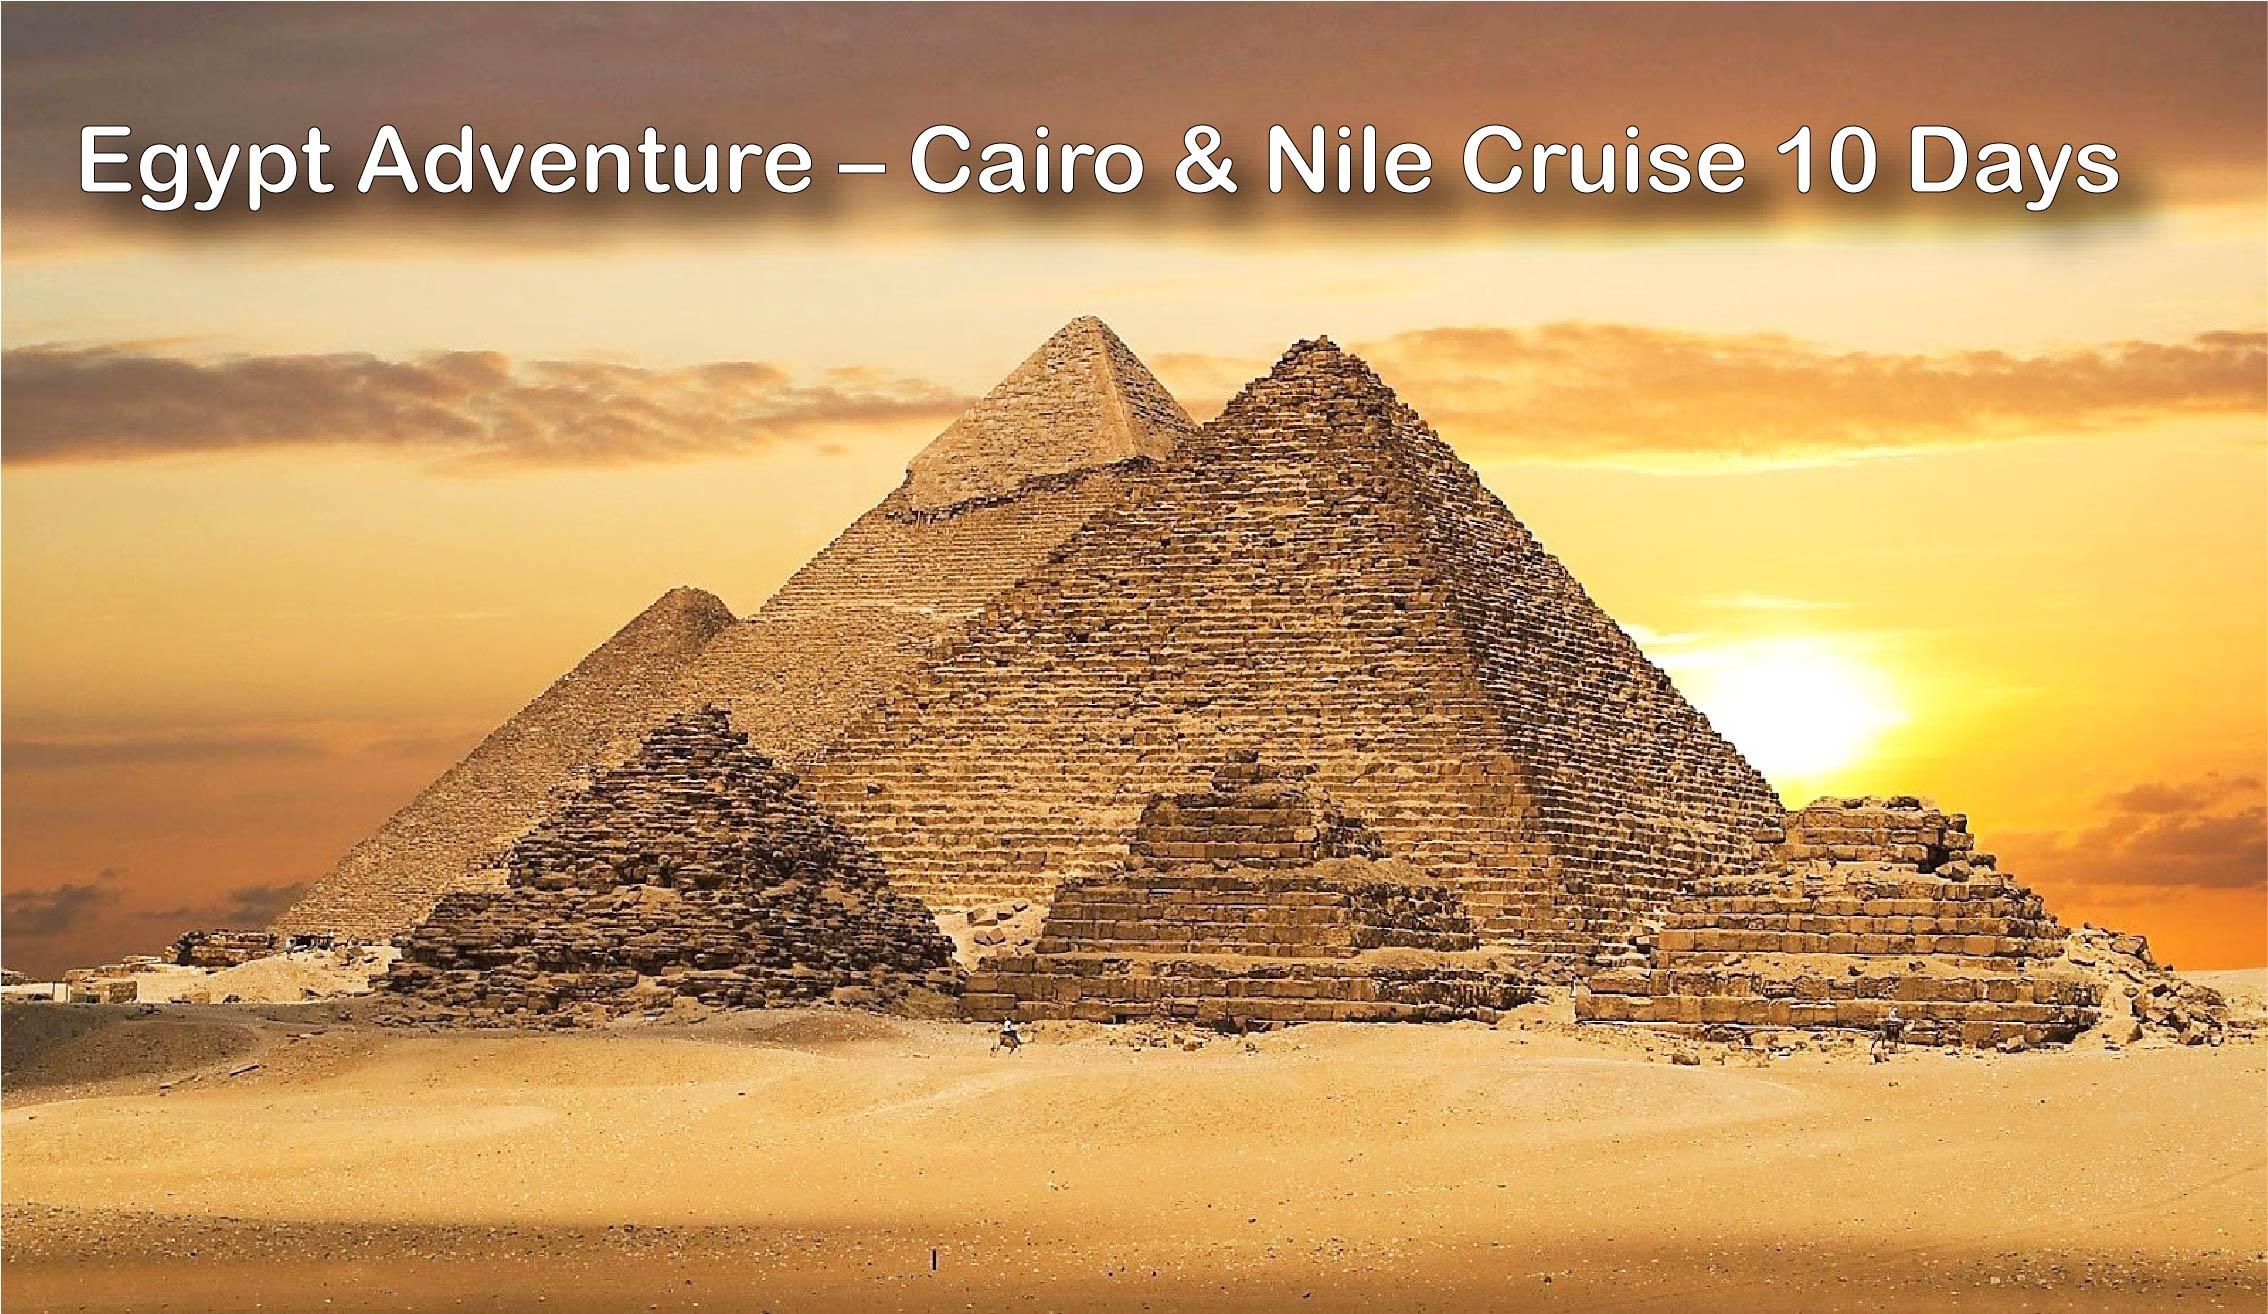 Egypt Adventure – Cairo & Nile Cruise 10 Days